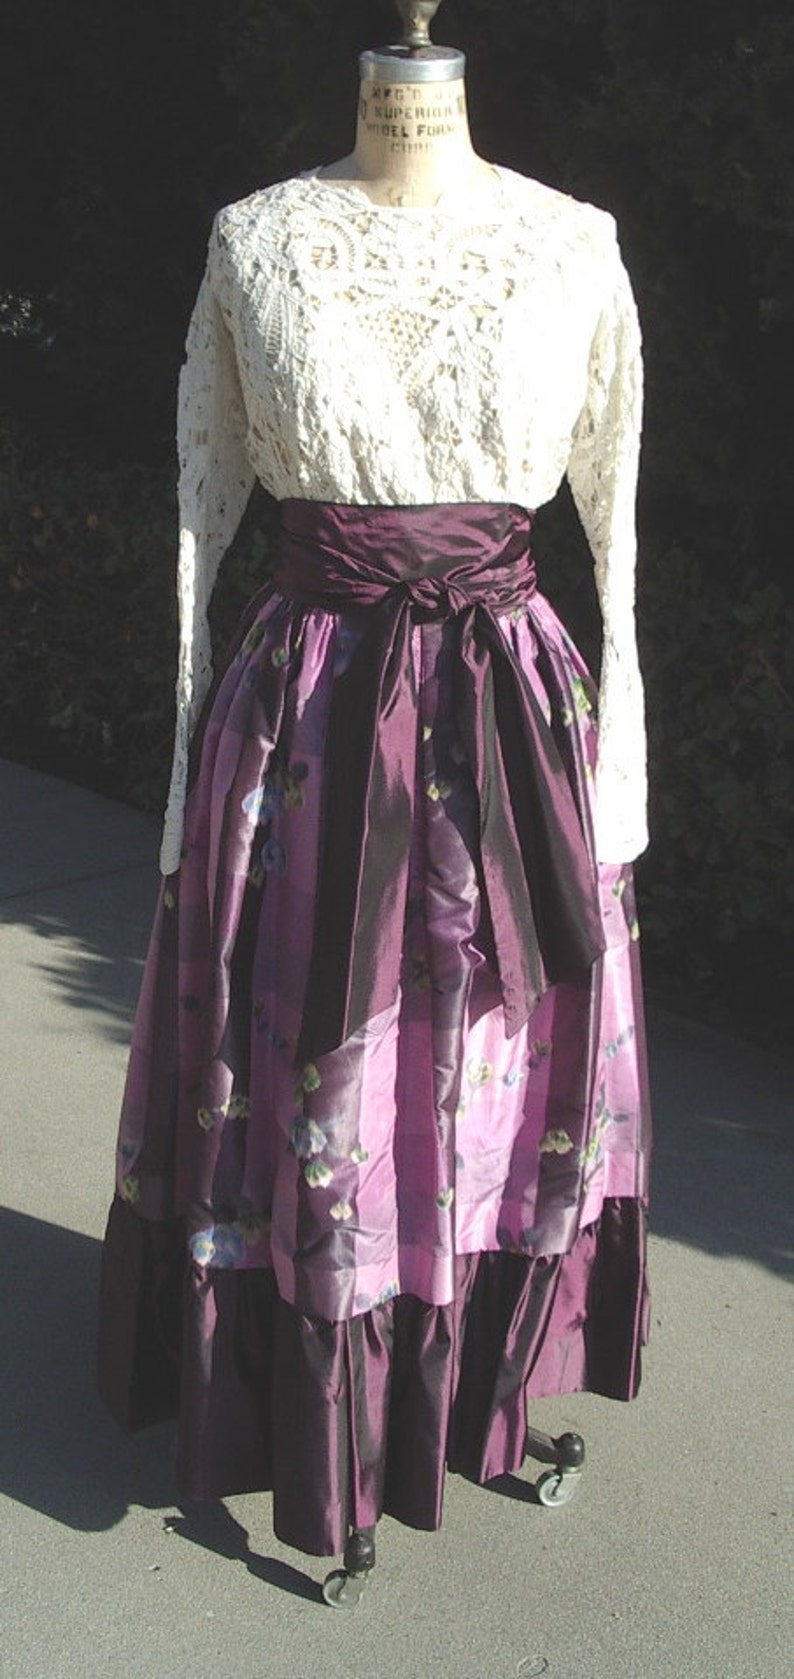 Plaid Warp Silk Taffeta Long BALL Skirt Original Designer Sample  Size10 Item #658 Dresses /& Gowns